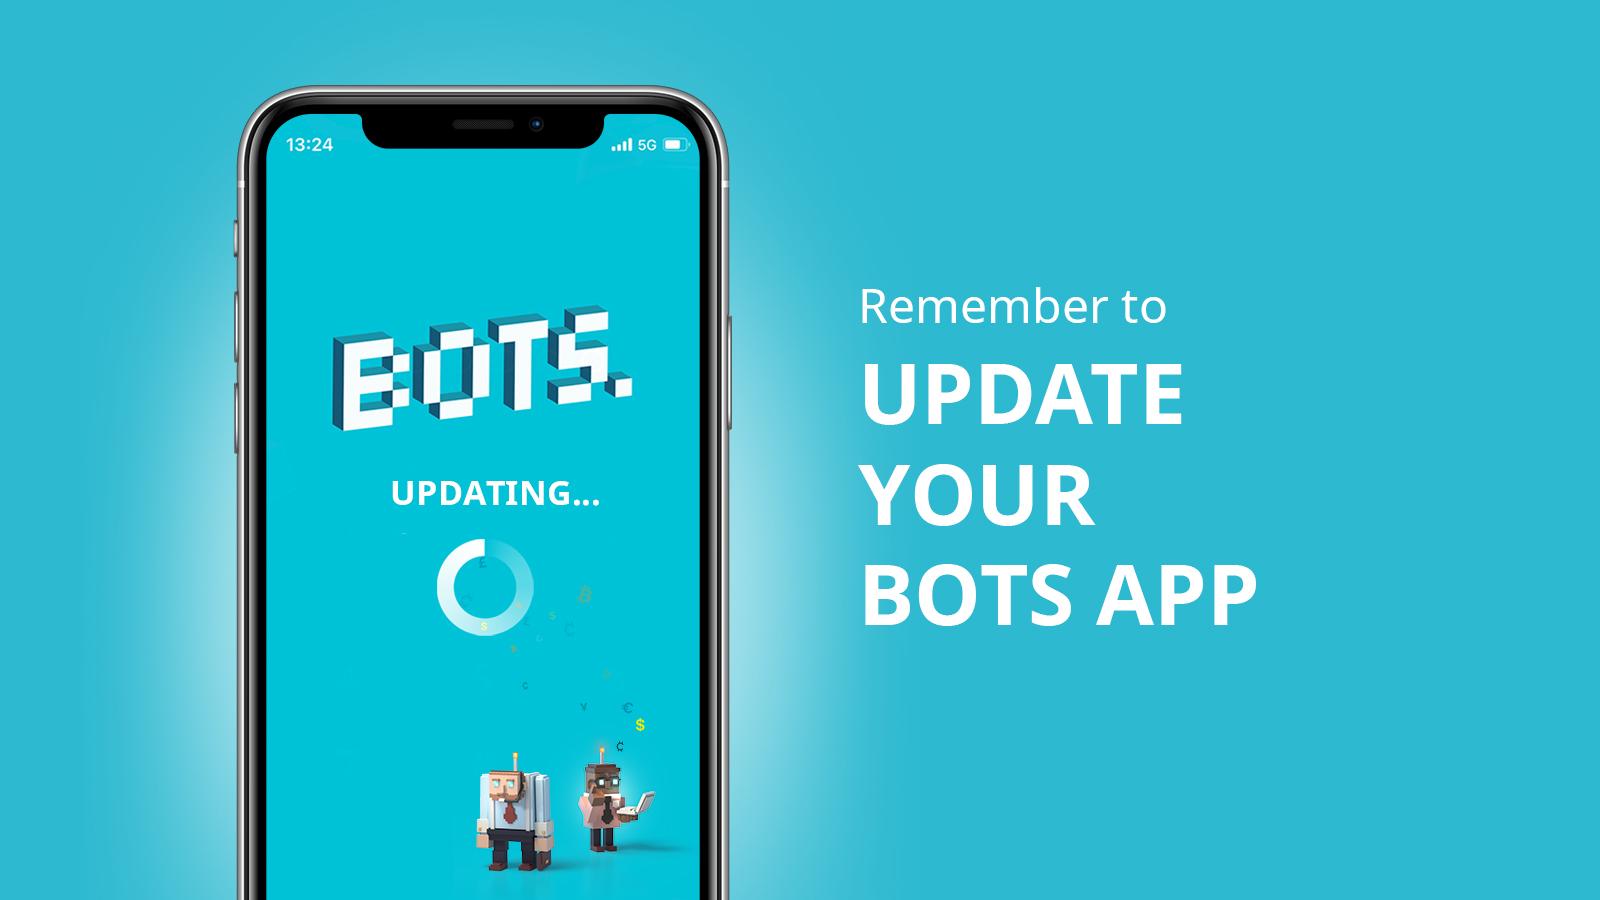 The BOTS app update